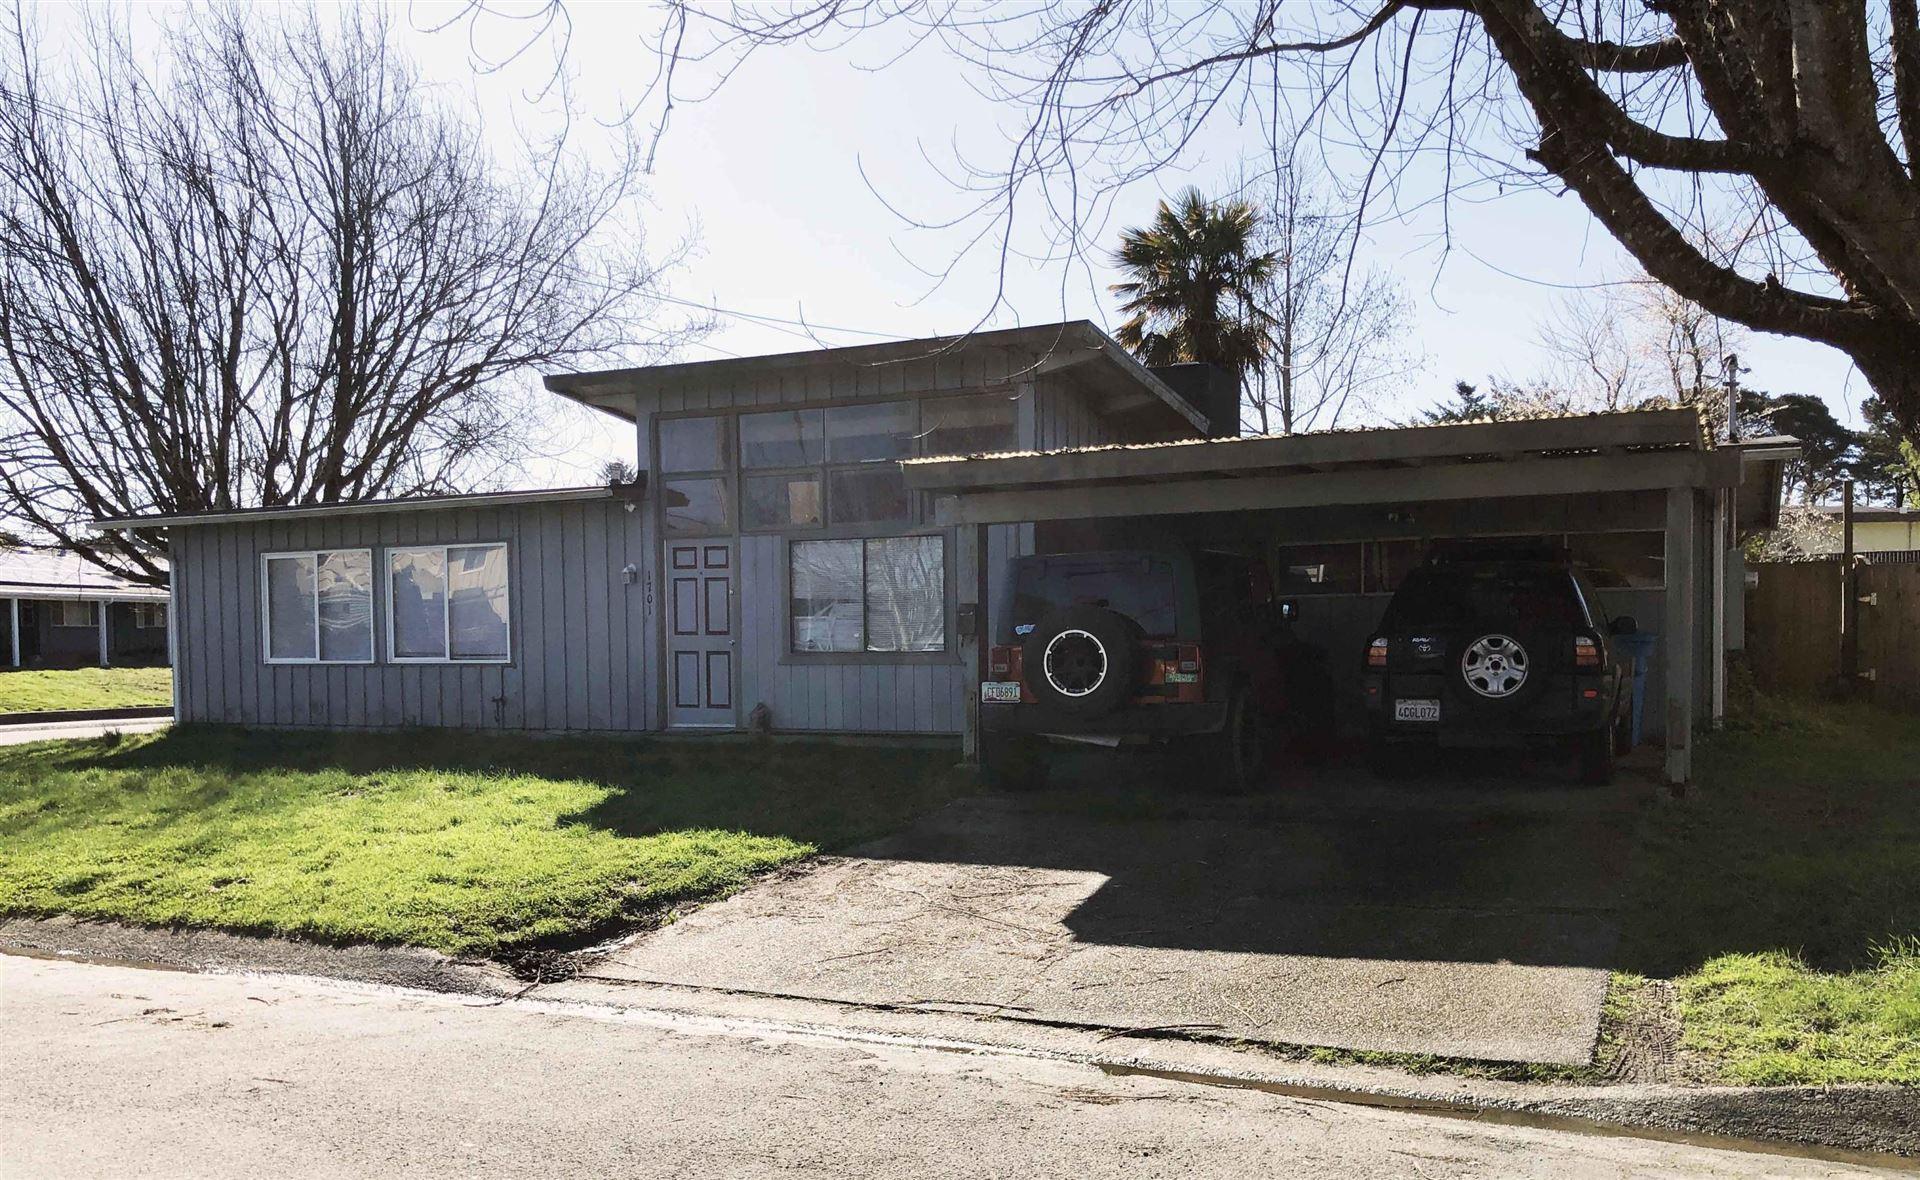 1701 Stewart Avenue, Arcata, CA 95521 - MLS#: 258417